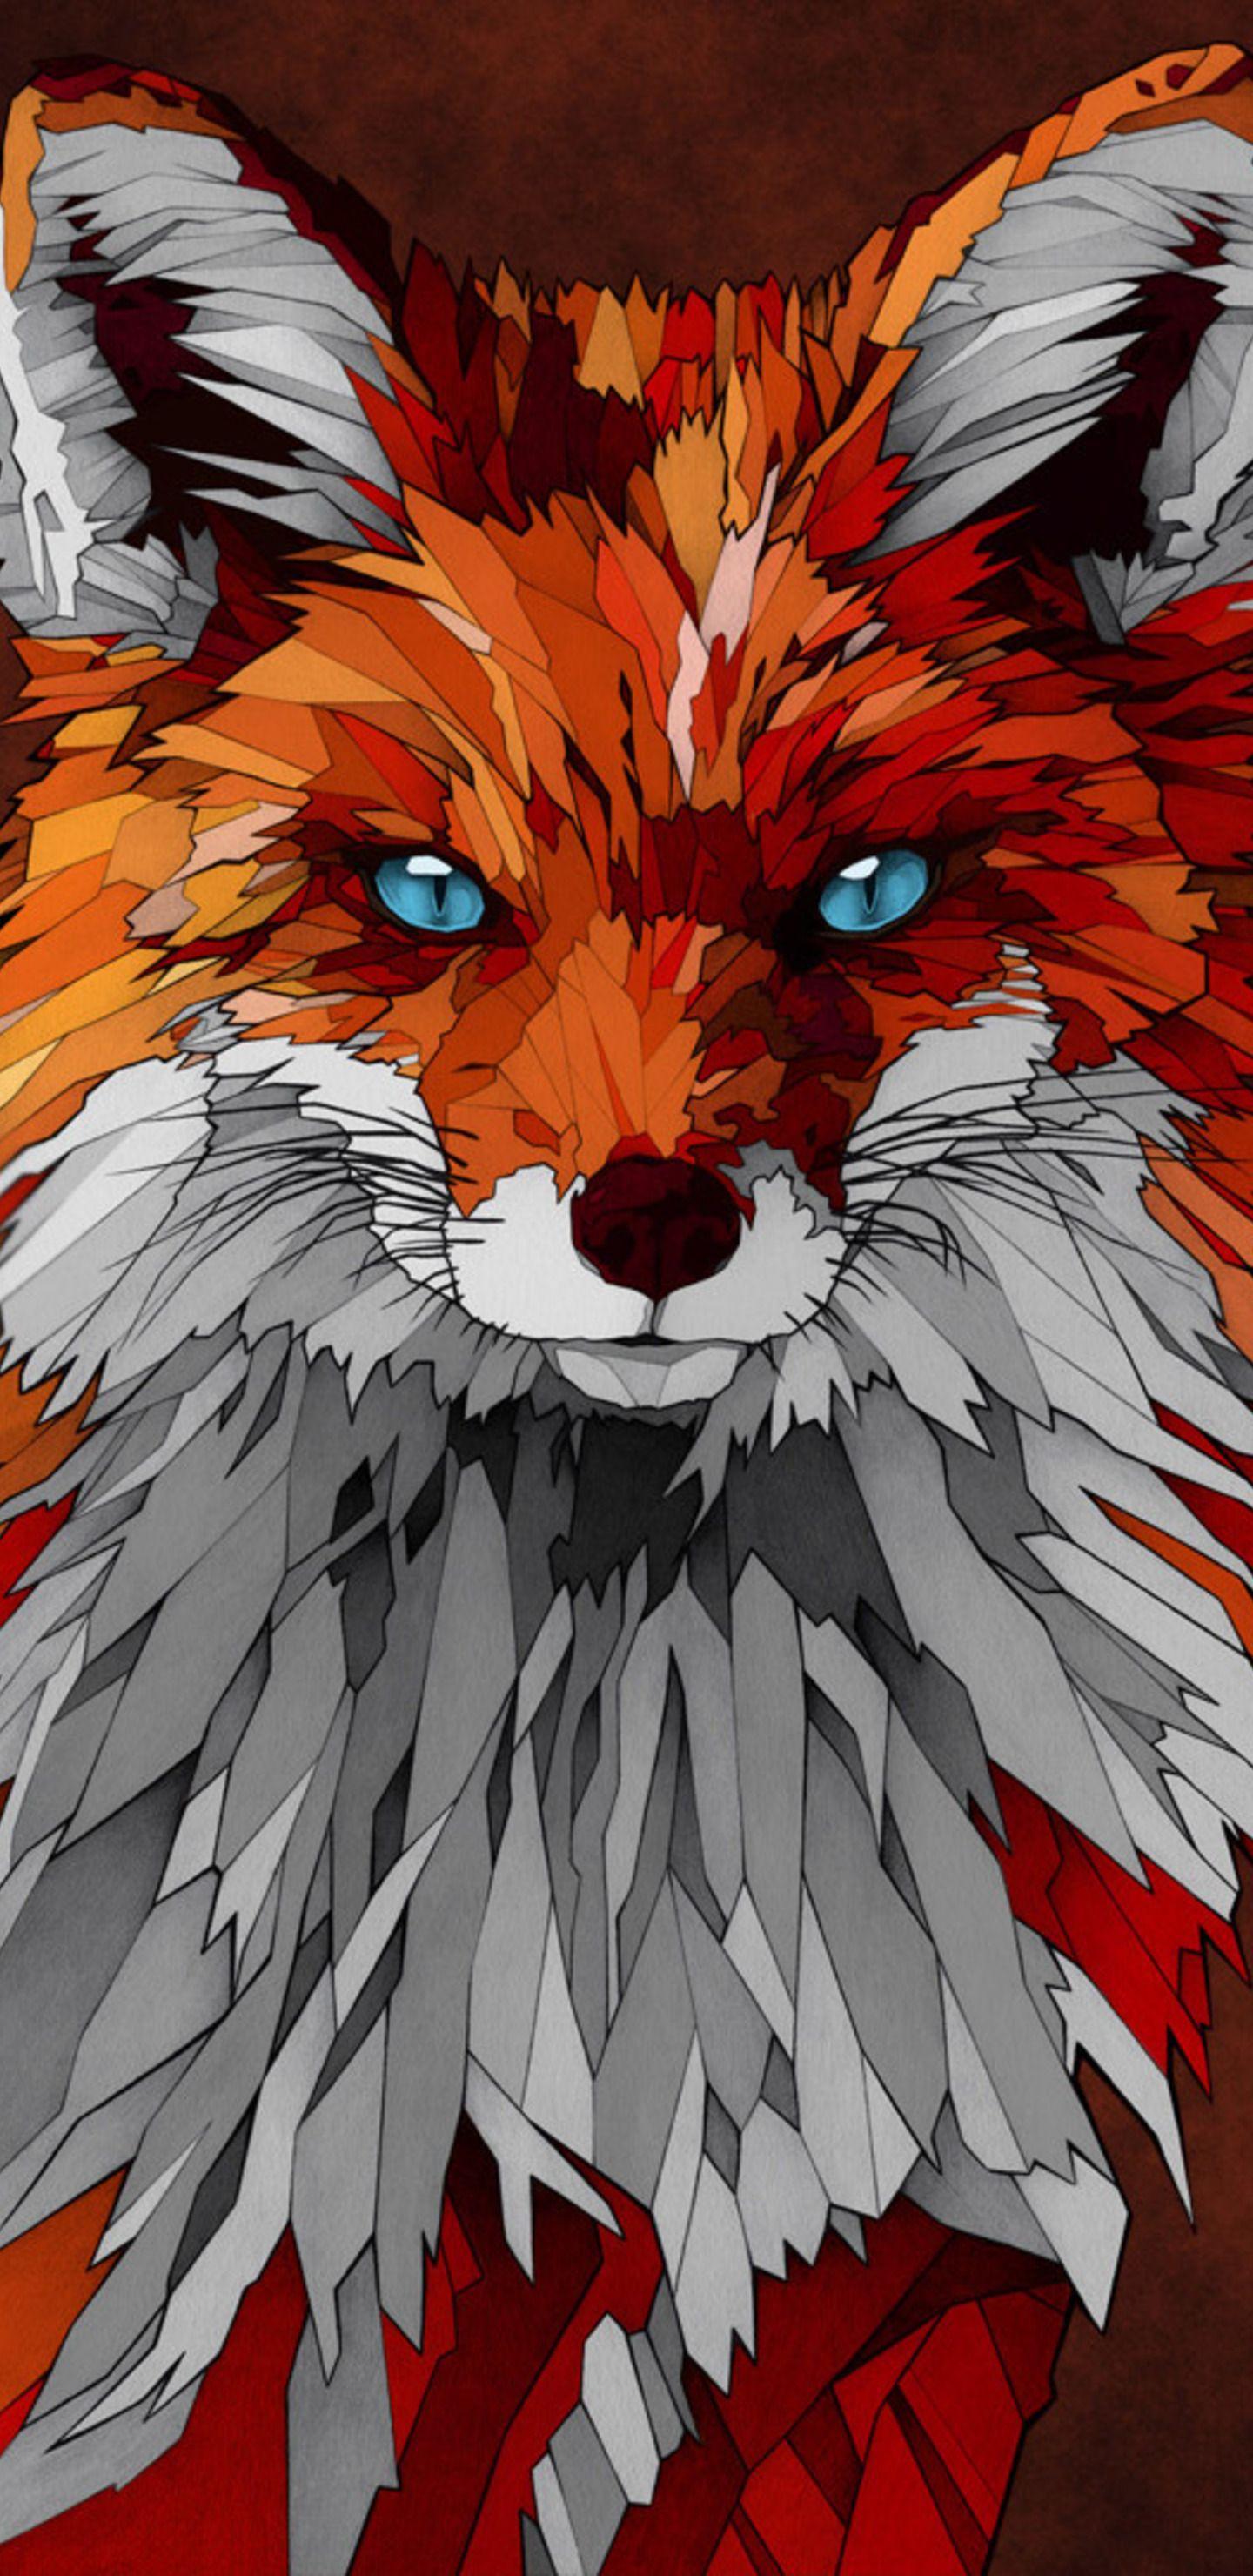 Fox Art Wallpapers Top Free Fox Art Backgrounds